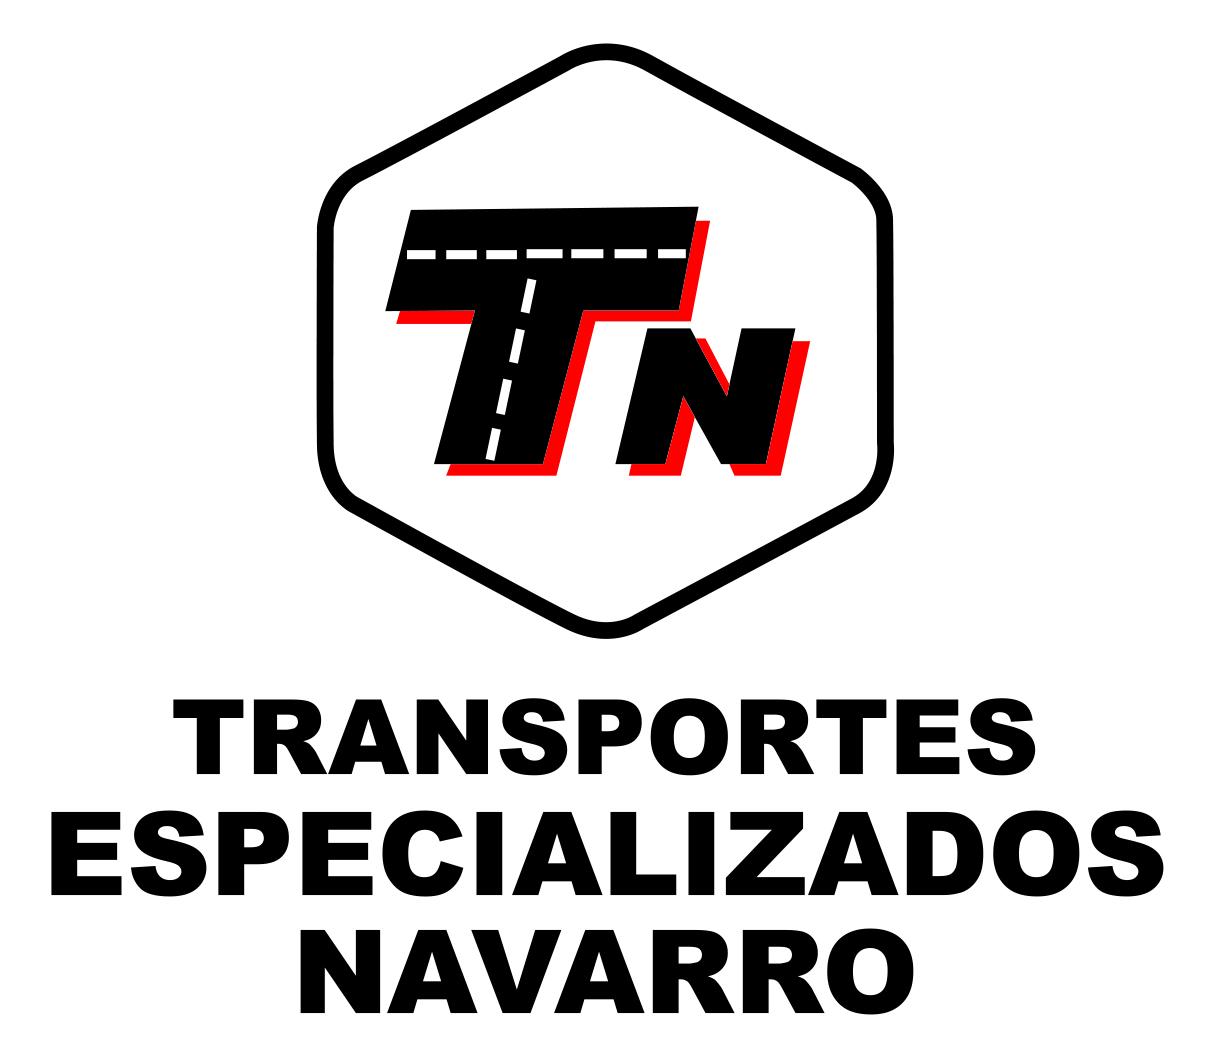 TRANSPORTES NAVARRO